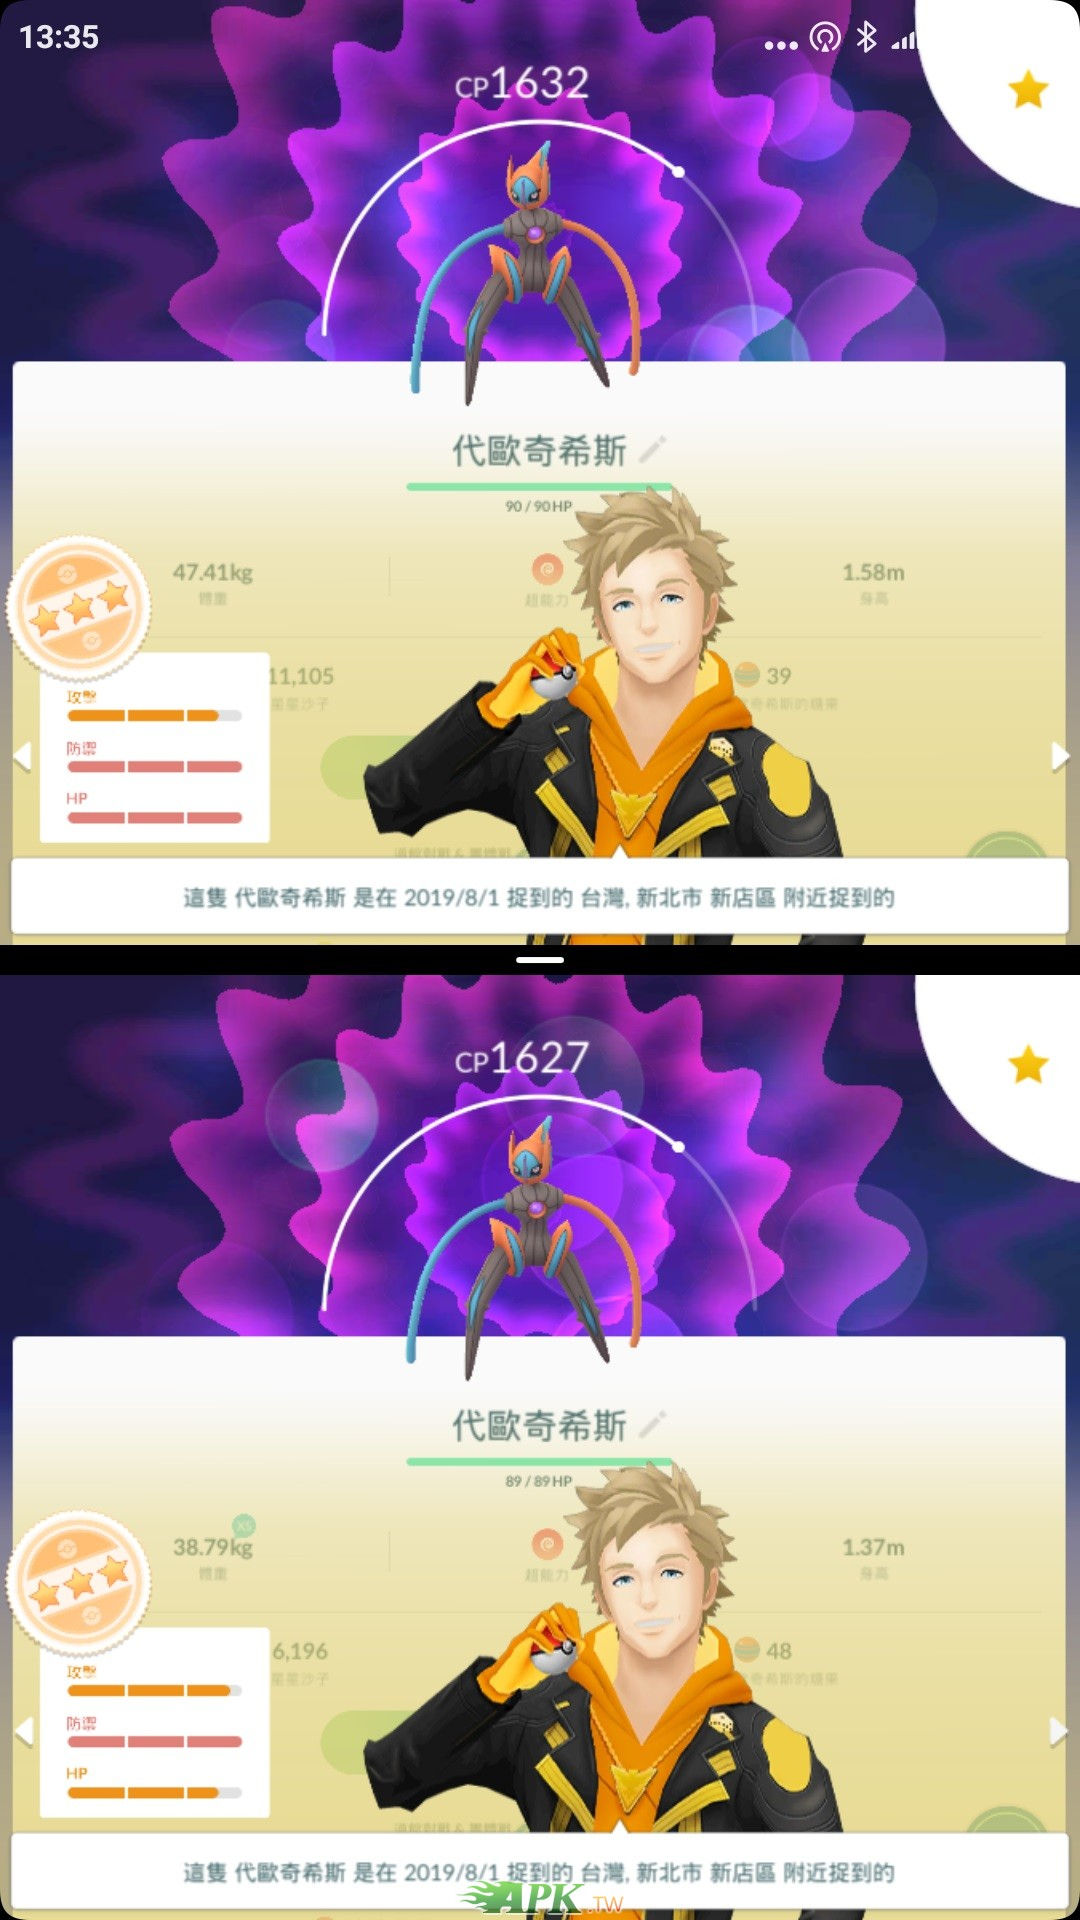 Screenshot_2019-08-01-13-35-44-483_com.nianticlabs.pokemongo.jpg